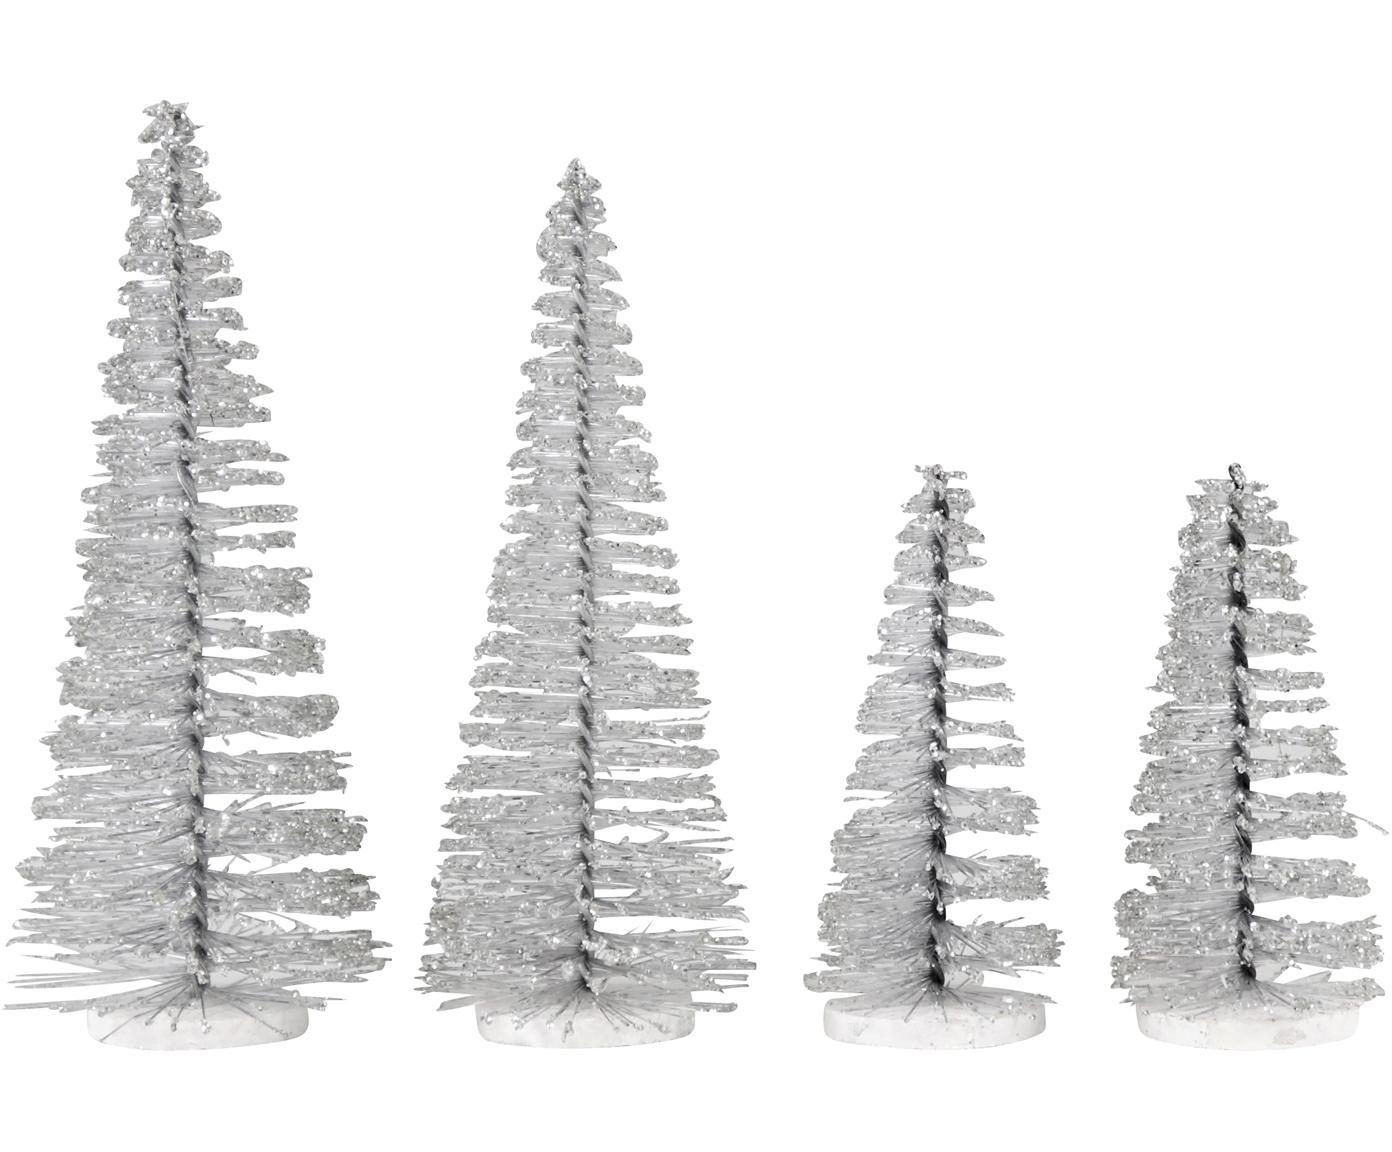 Deko-Objekt-Set Glam, 4-tlg., Kunststoff, Metall, Silberfarben, Sondergrößen